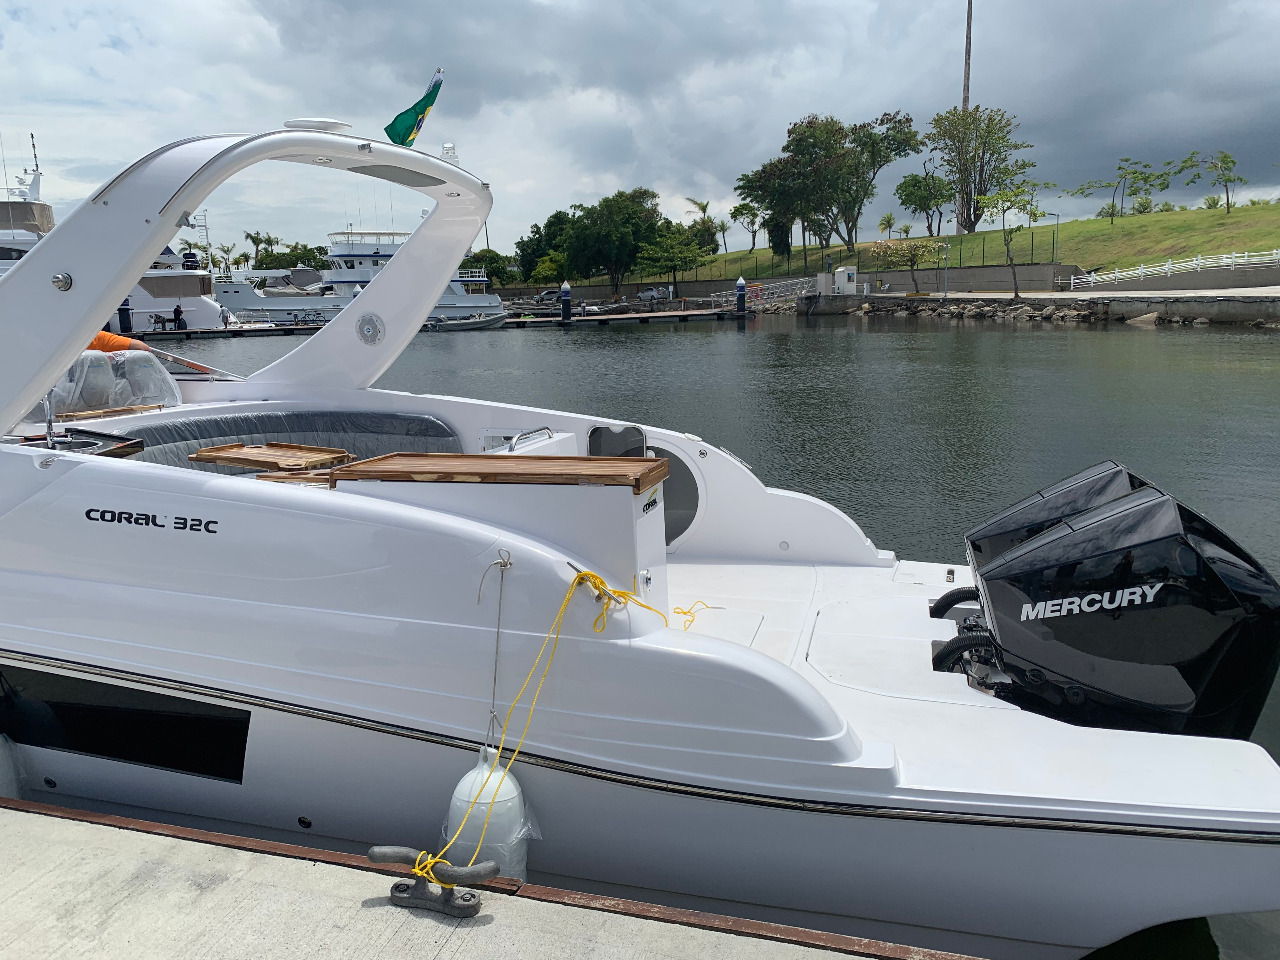 Coral 32C lancha motor de popa - boat shopping